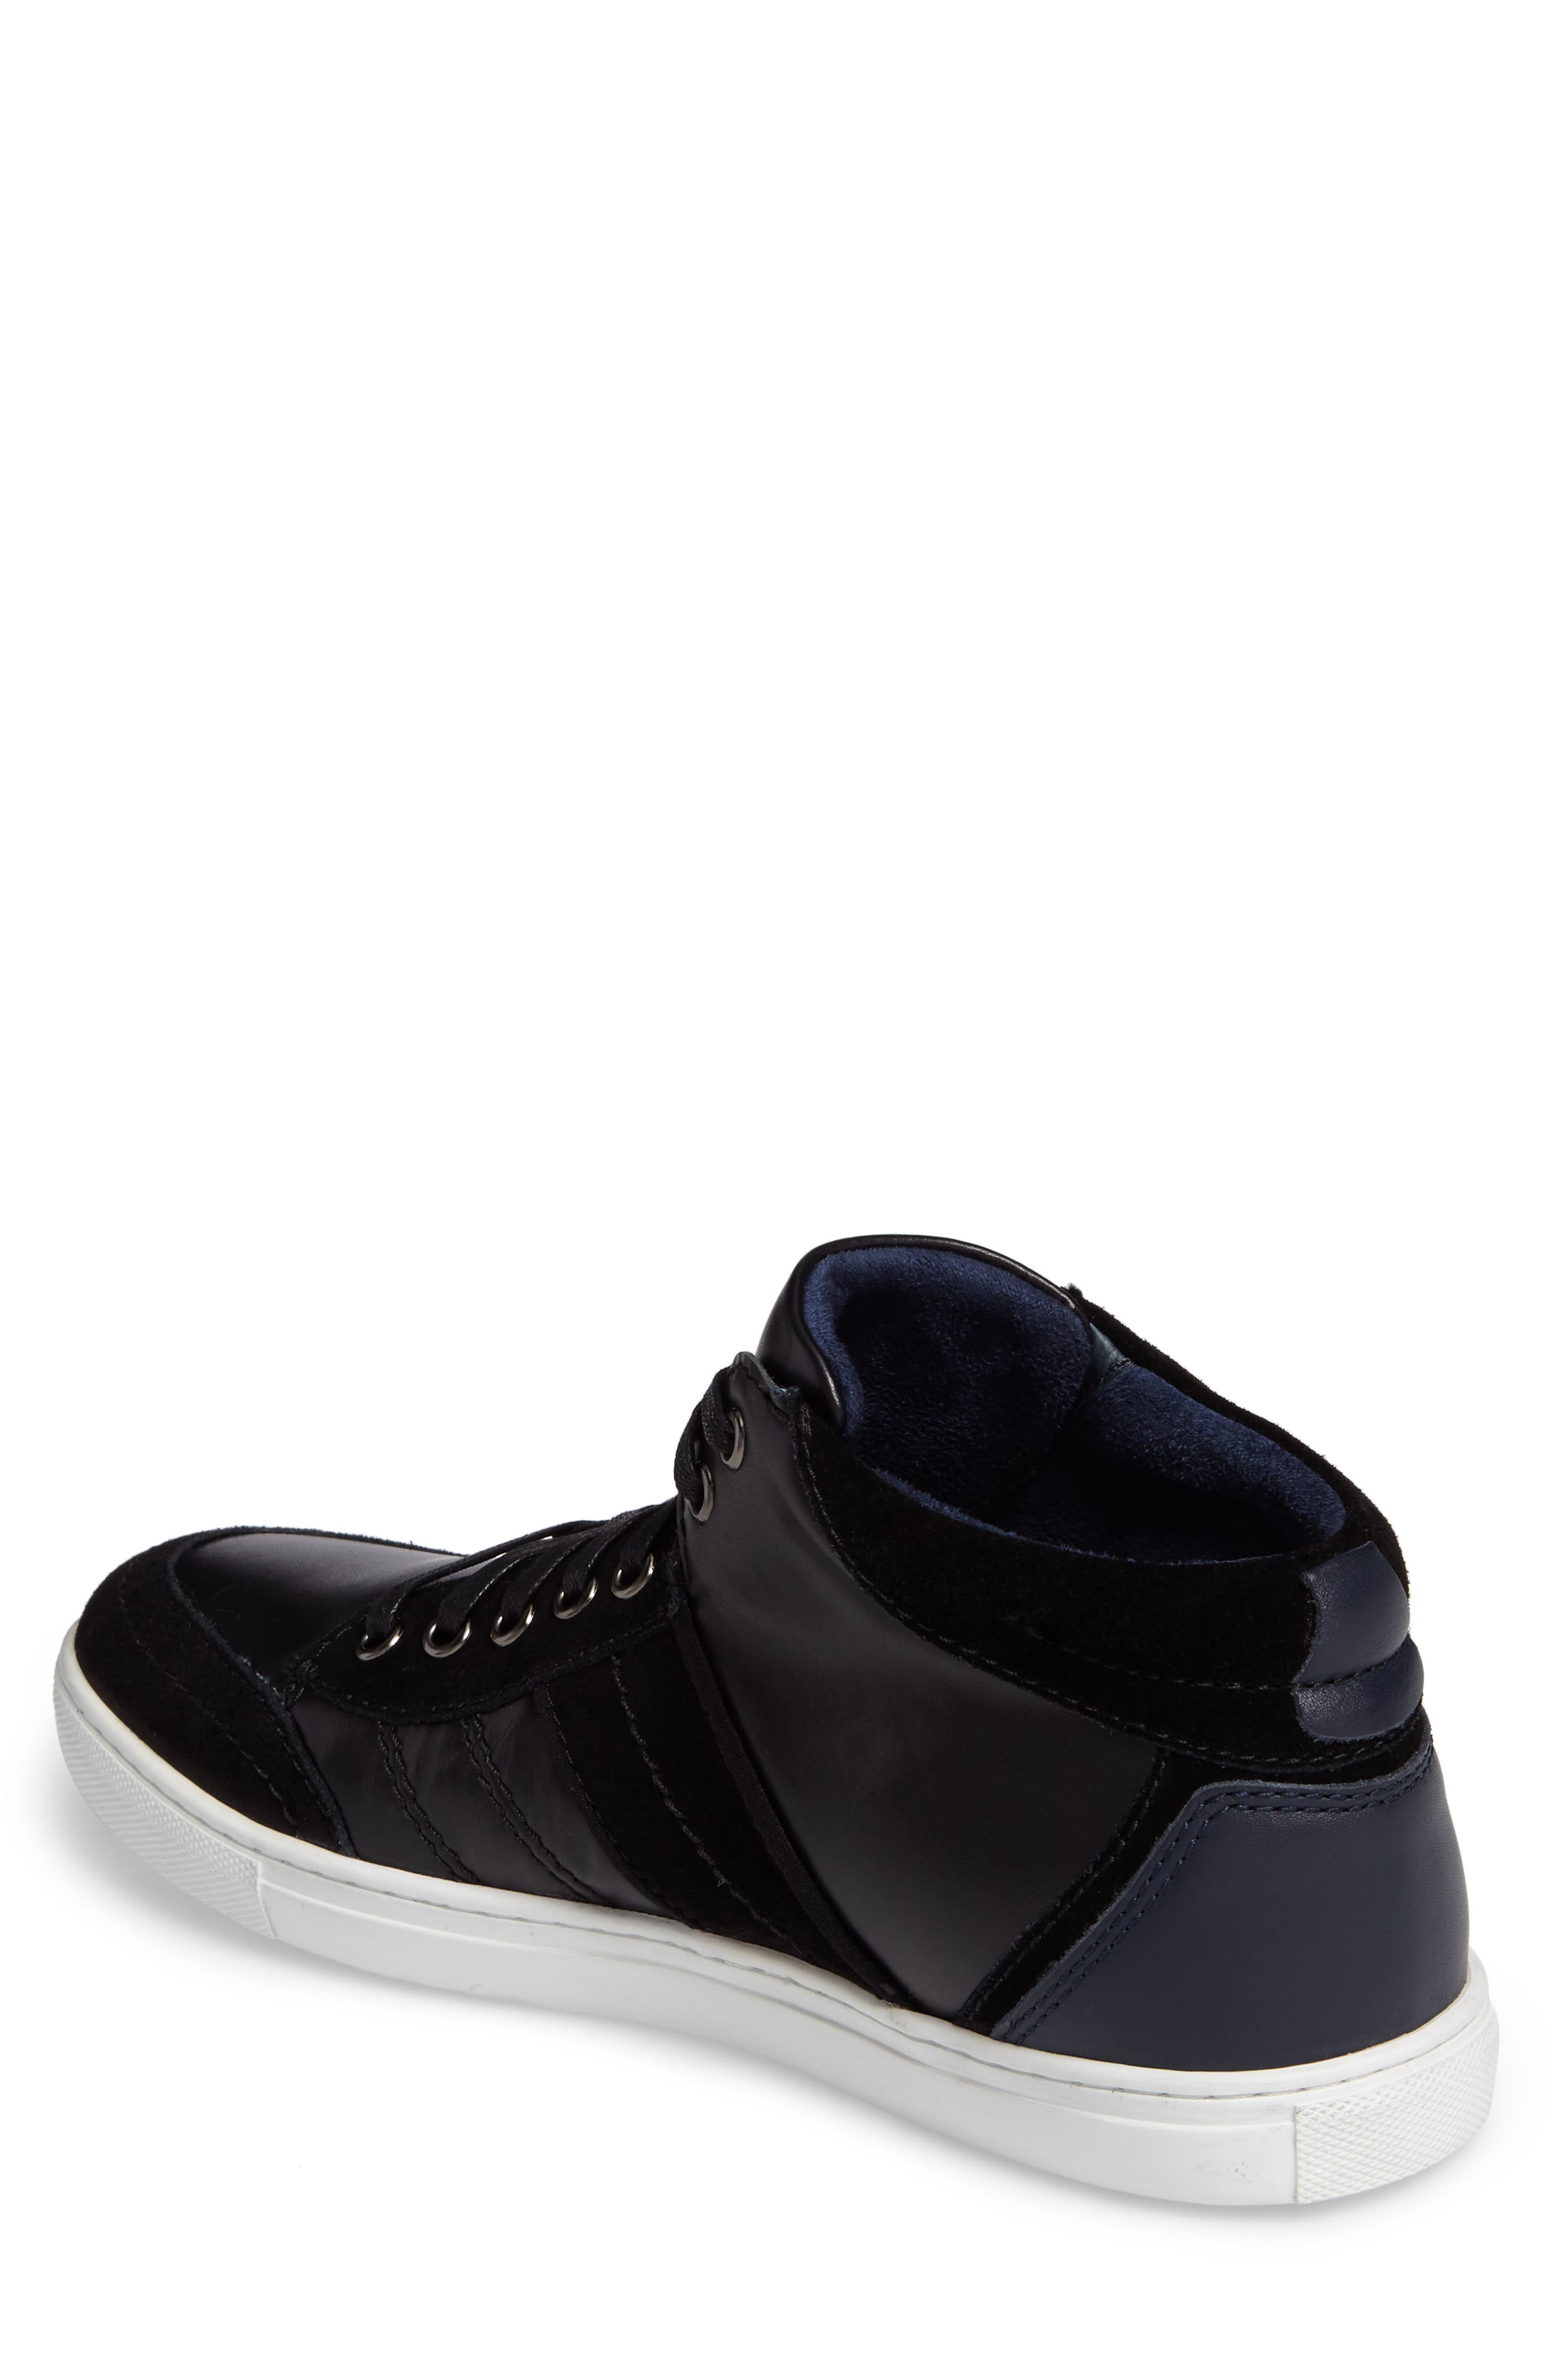 Viper Sneaker,                             Alternate thumbnail 2, color,                             BLACK